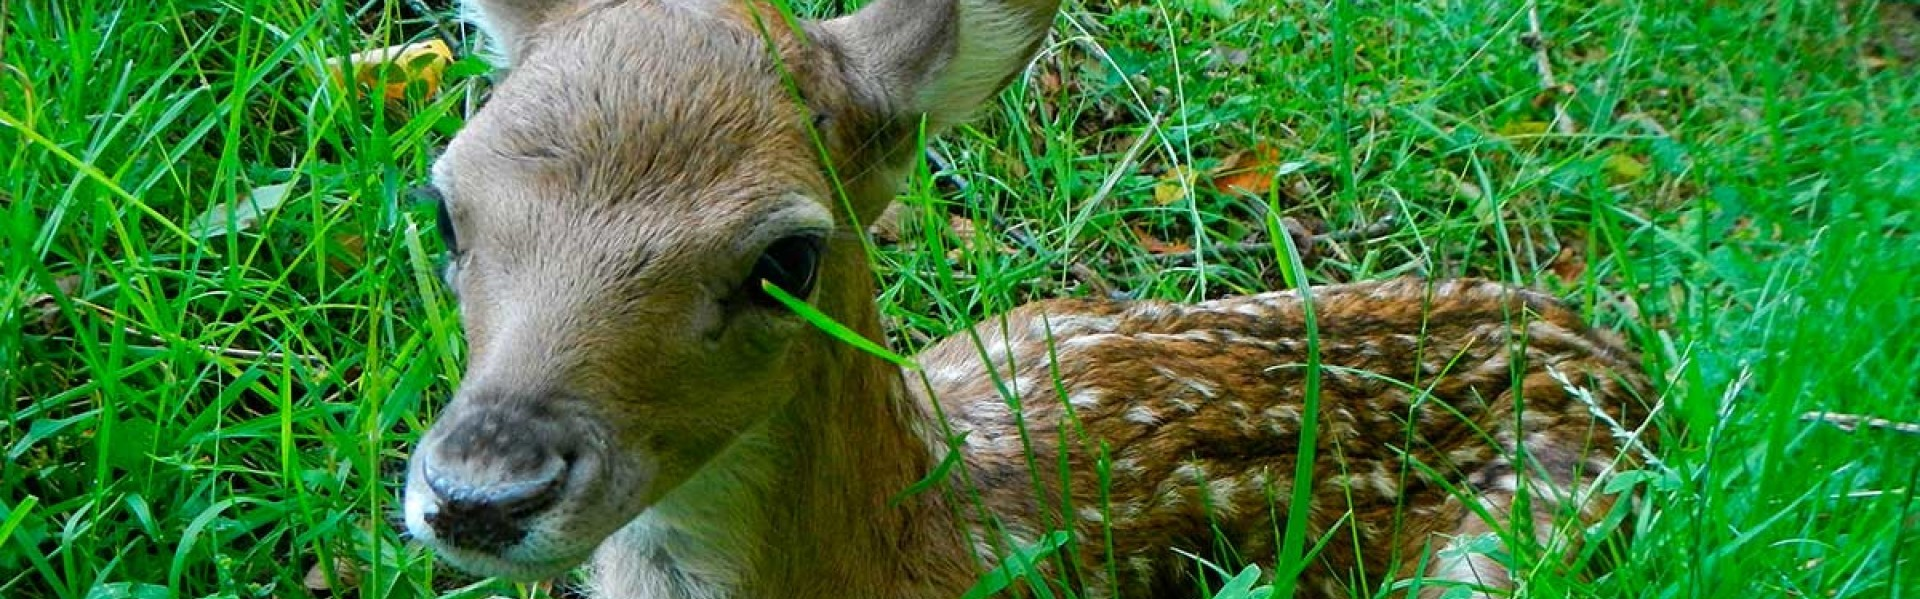 Allevamento di cervi | Rongrino